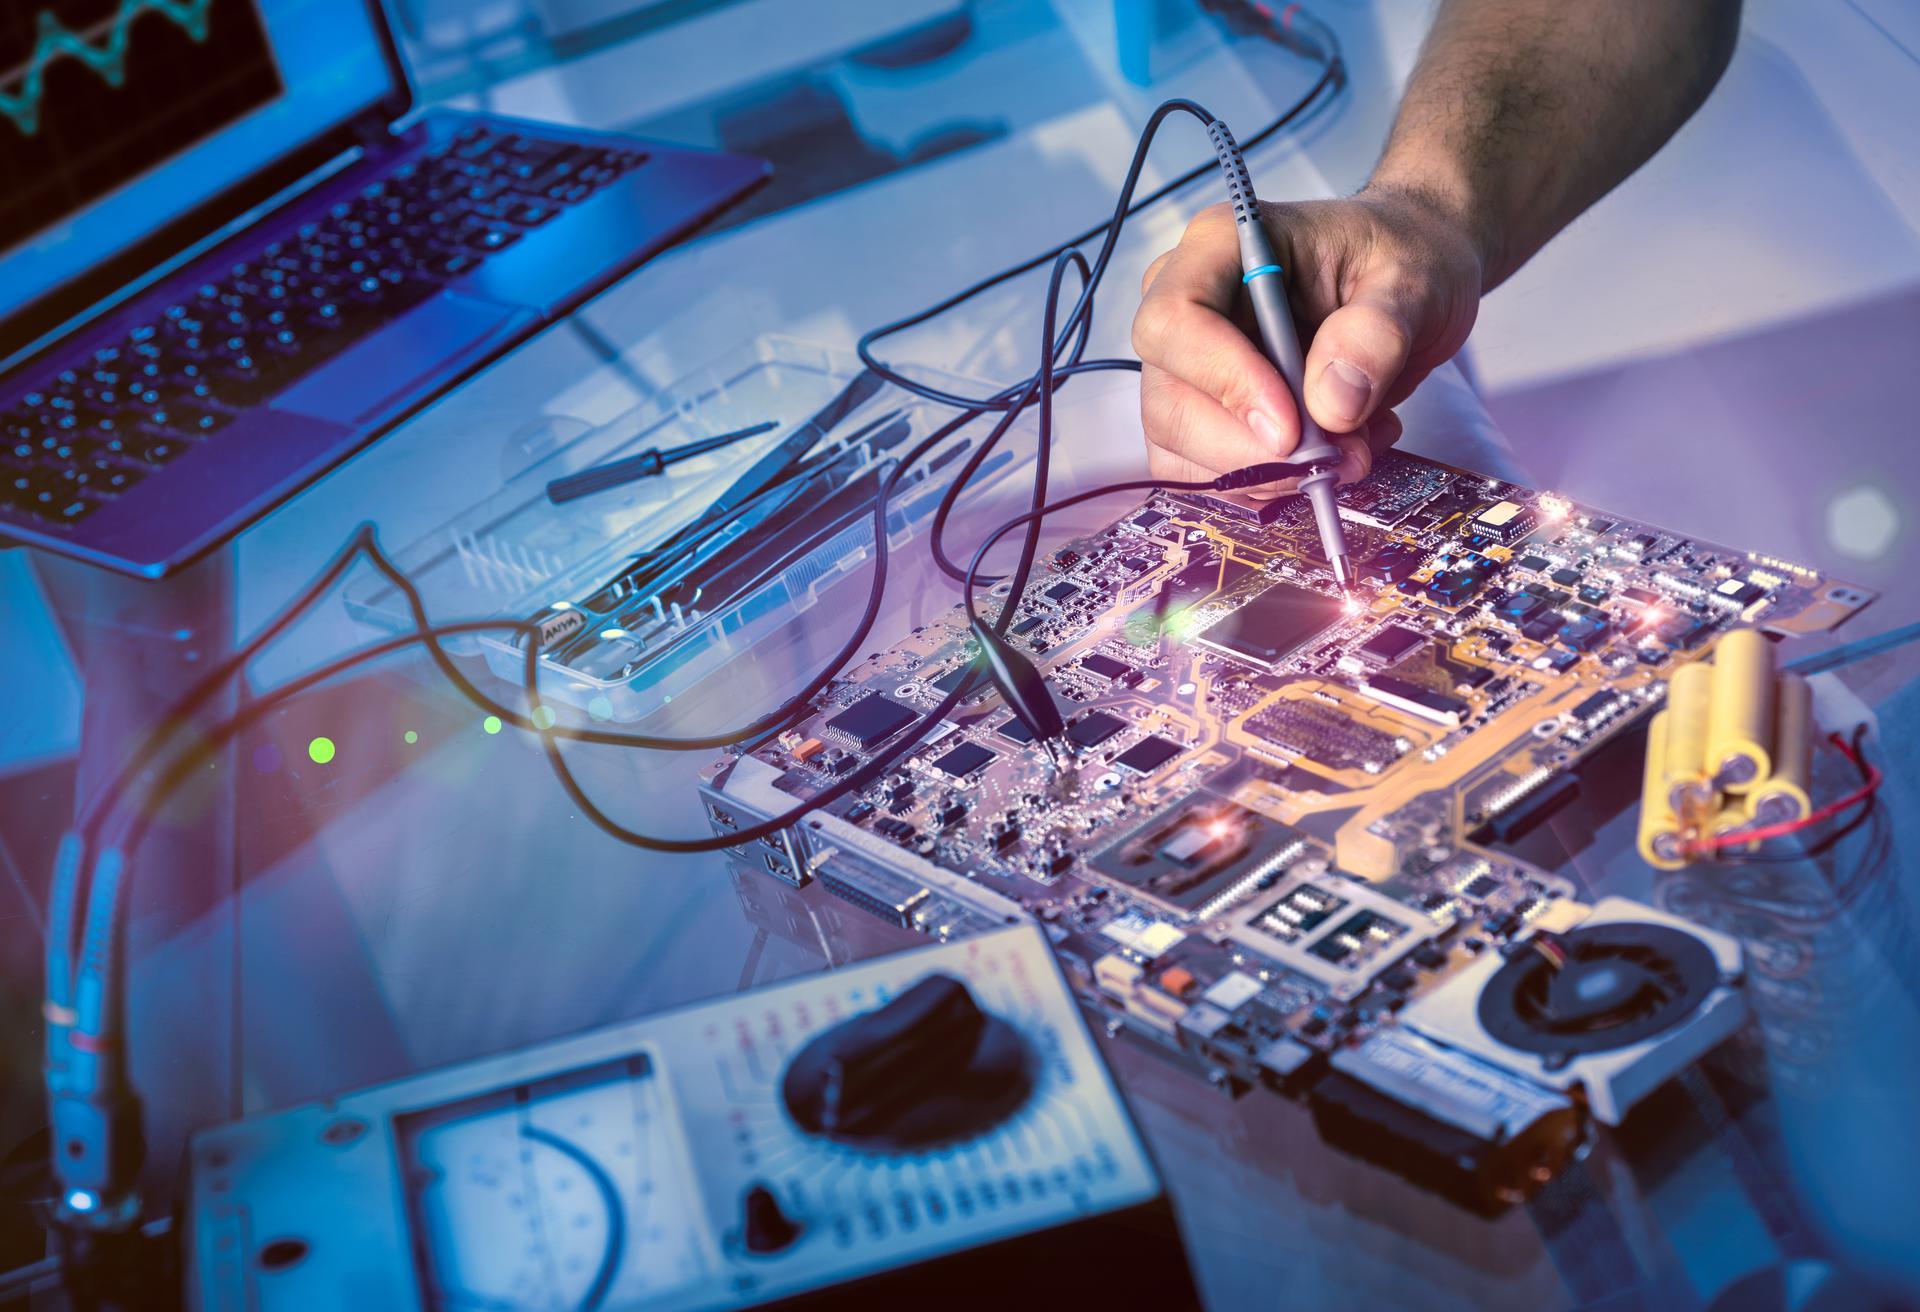 See N Select - Electronics Repair Shop Near Me in London